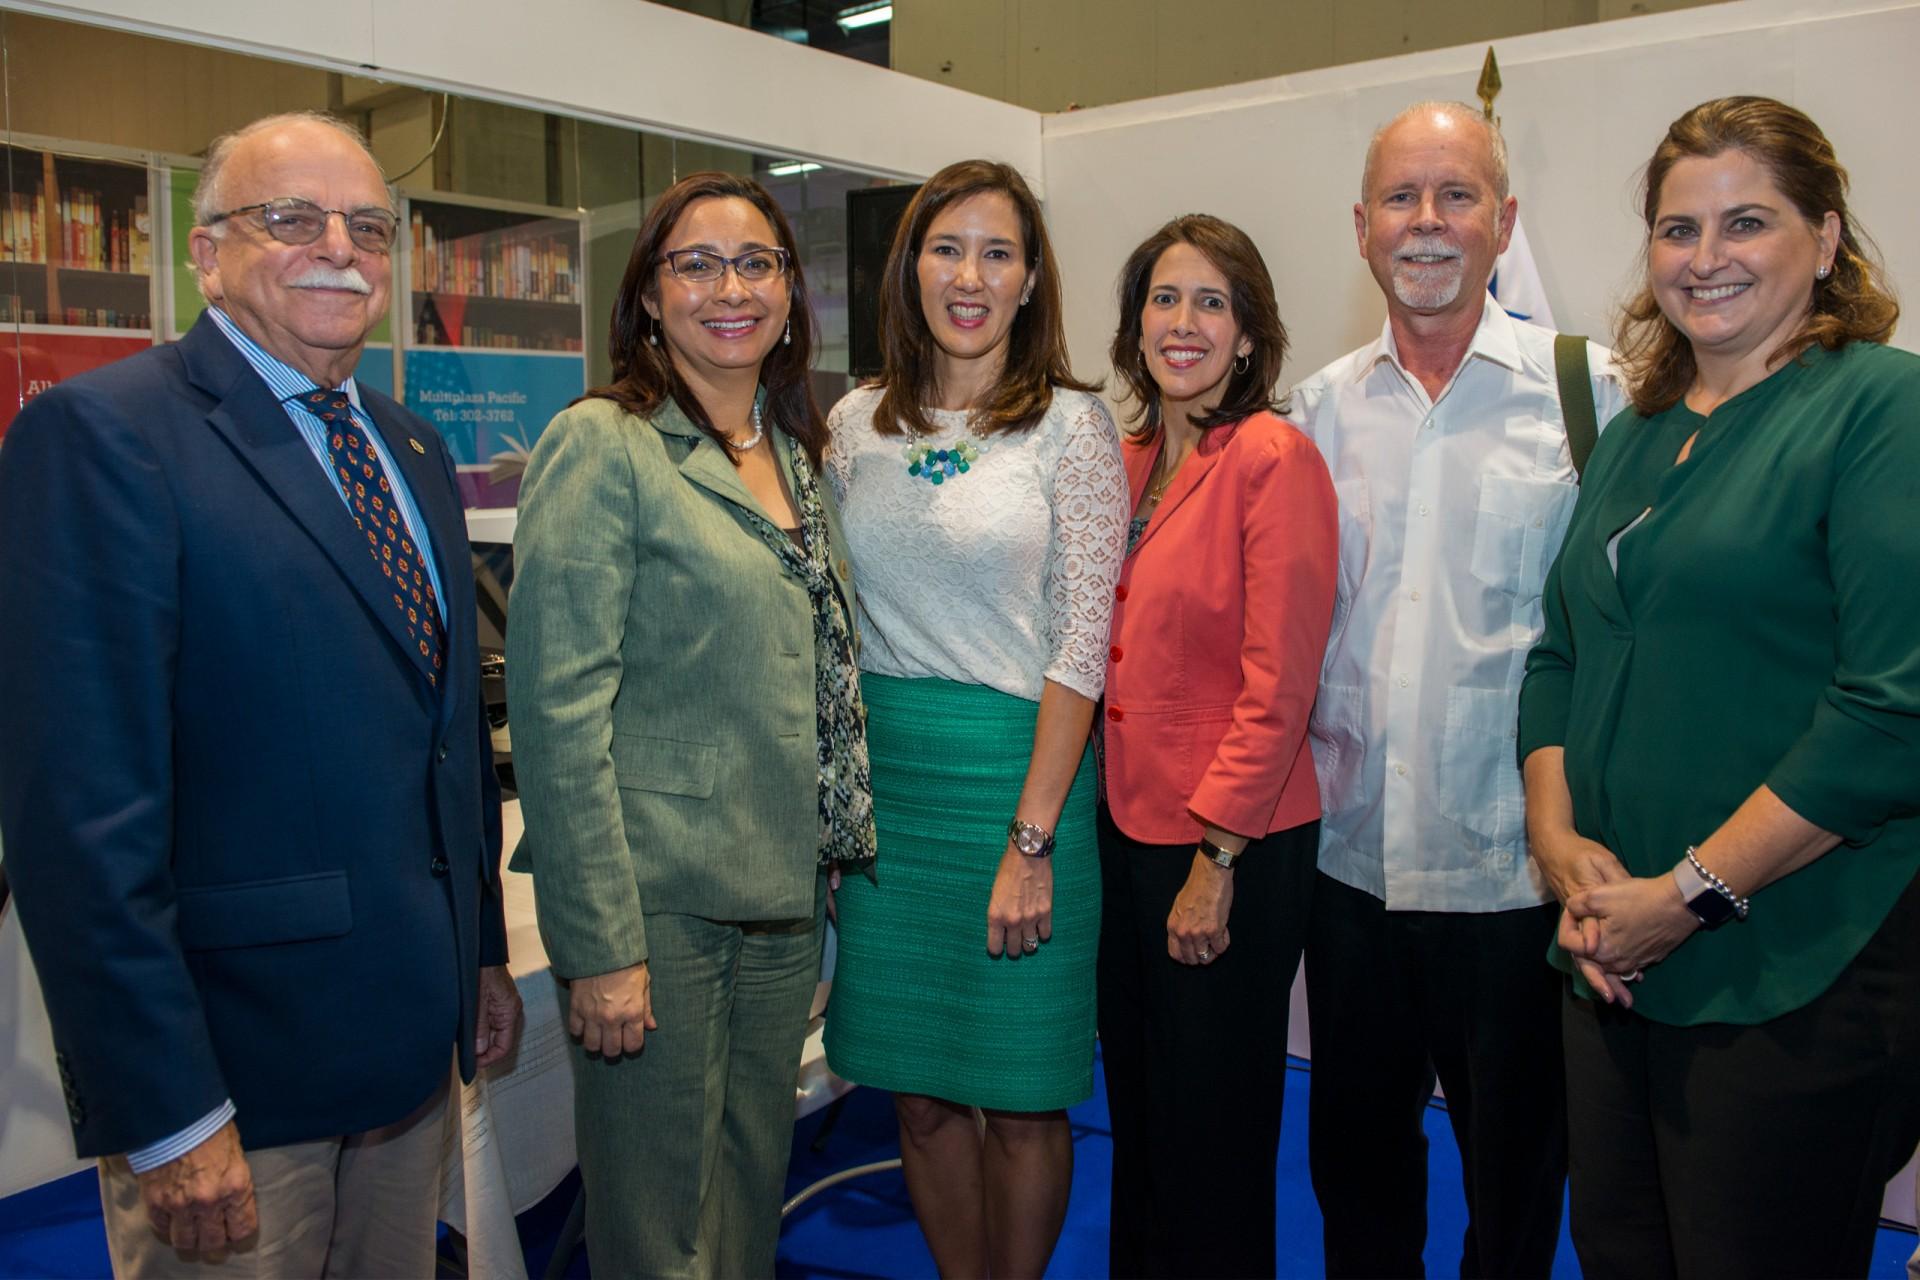 Ira Rubinoff, left, visits the Panama International Book Fair